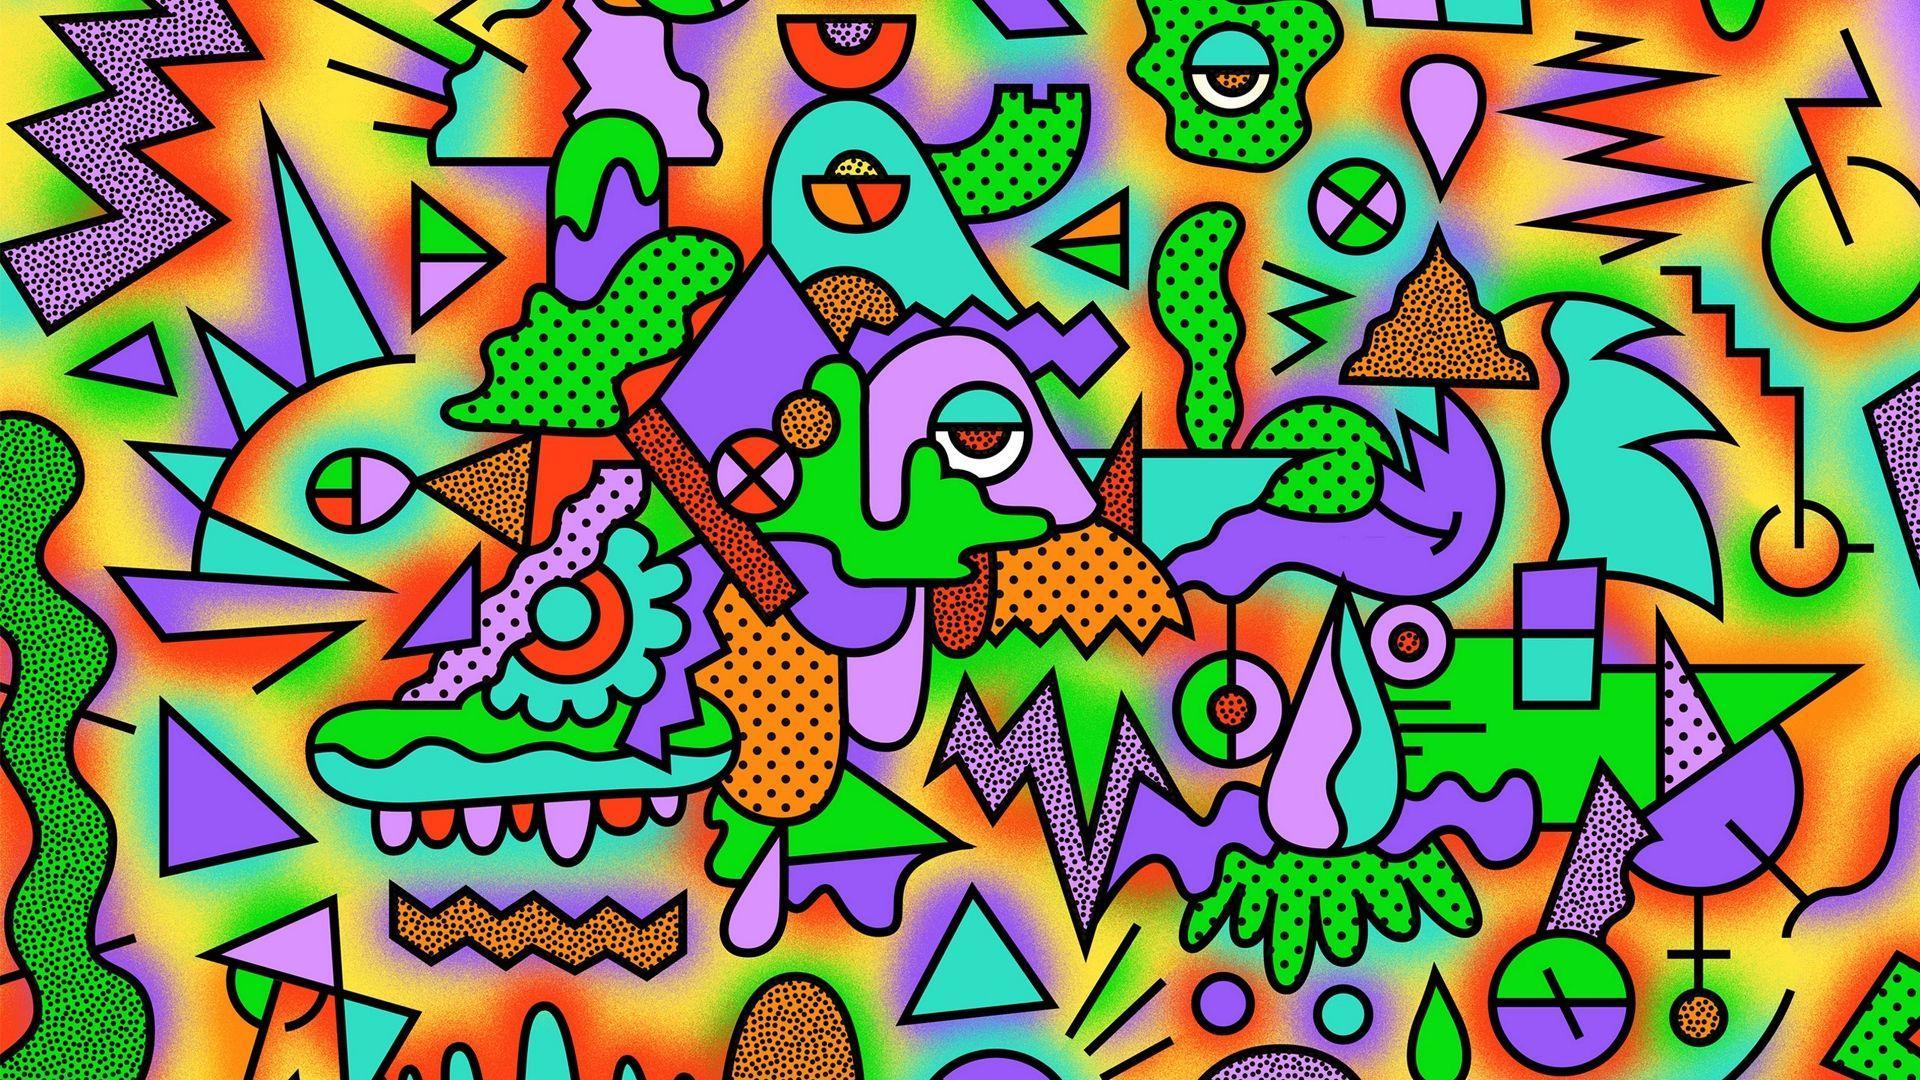 Acid phone wallpapers top free acid phone backgrounds colorful acid drawing trippy art tumblr jpg 1920x1080